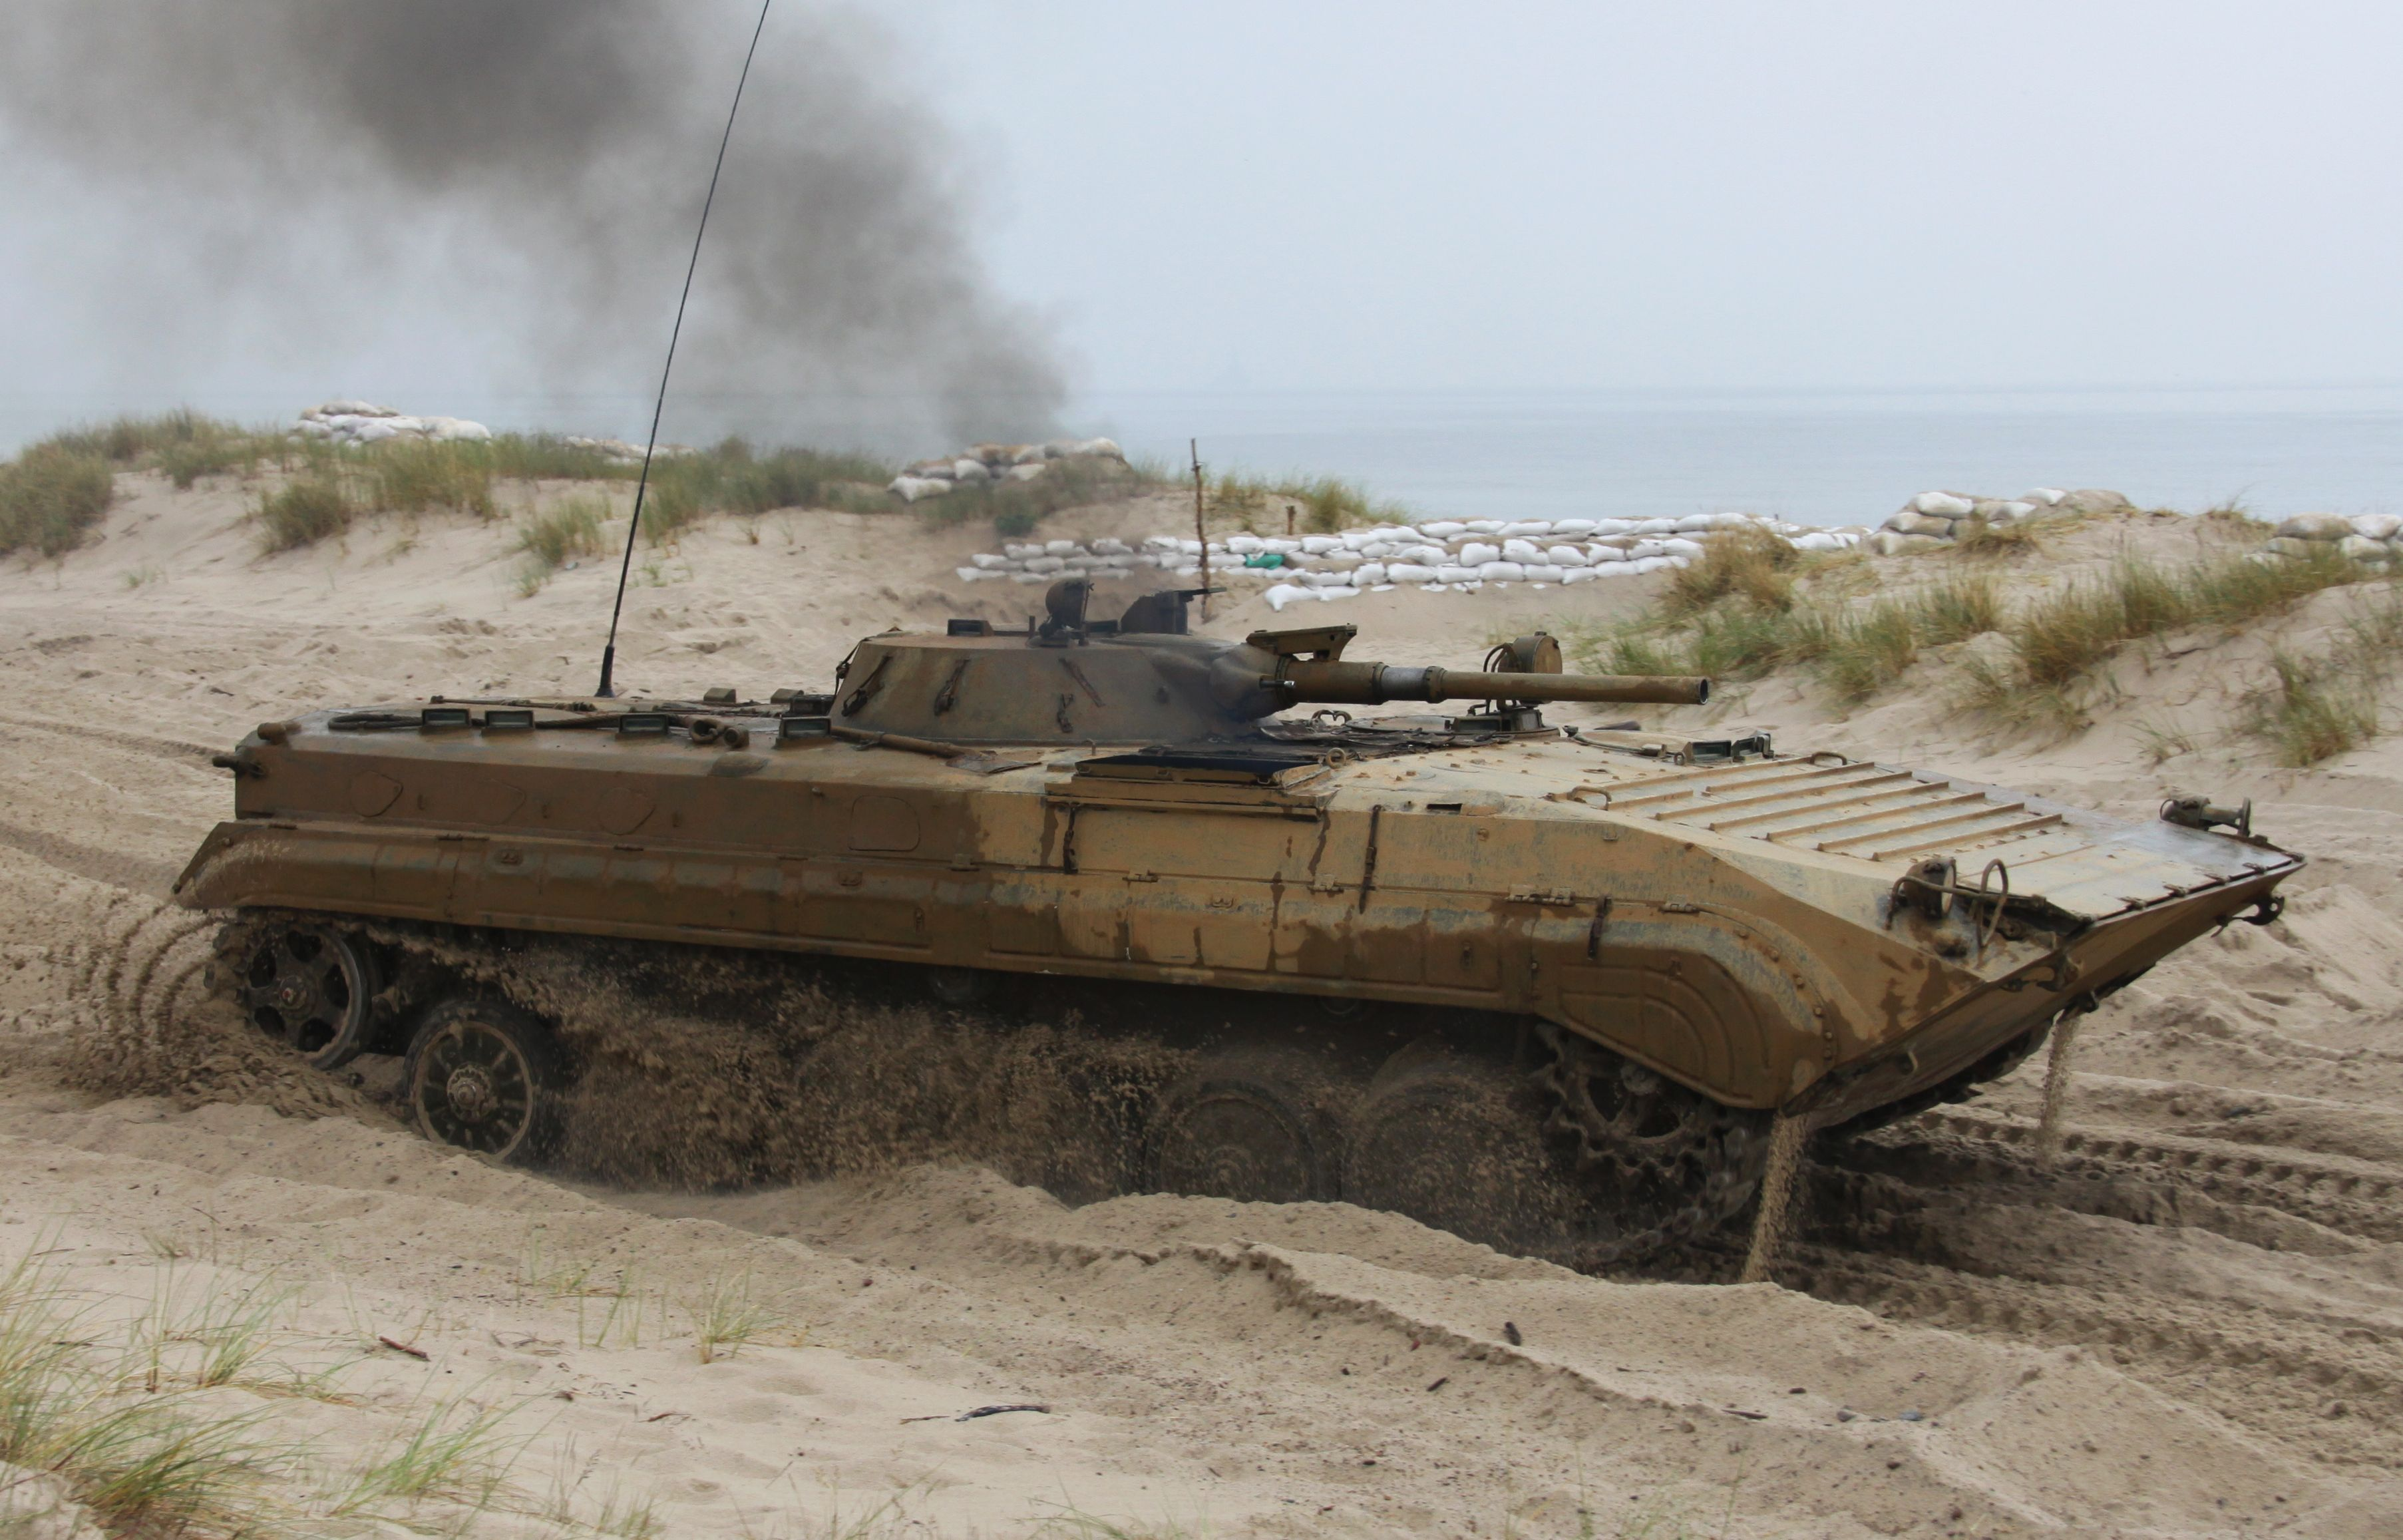 Depiction of BMP-1